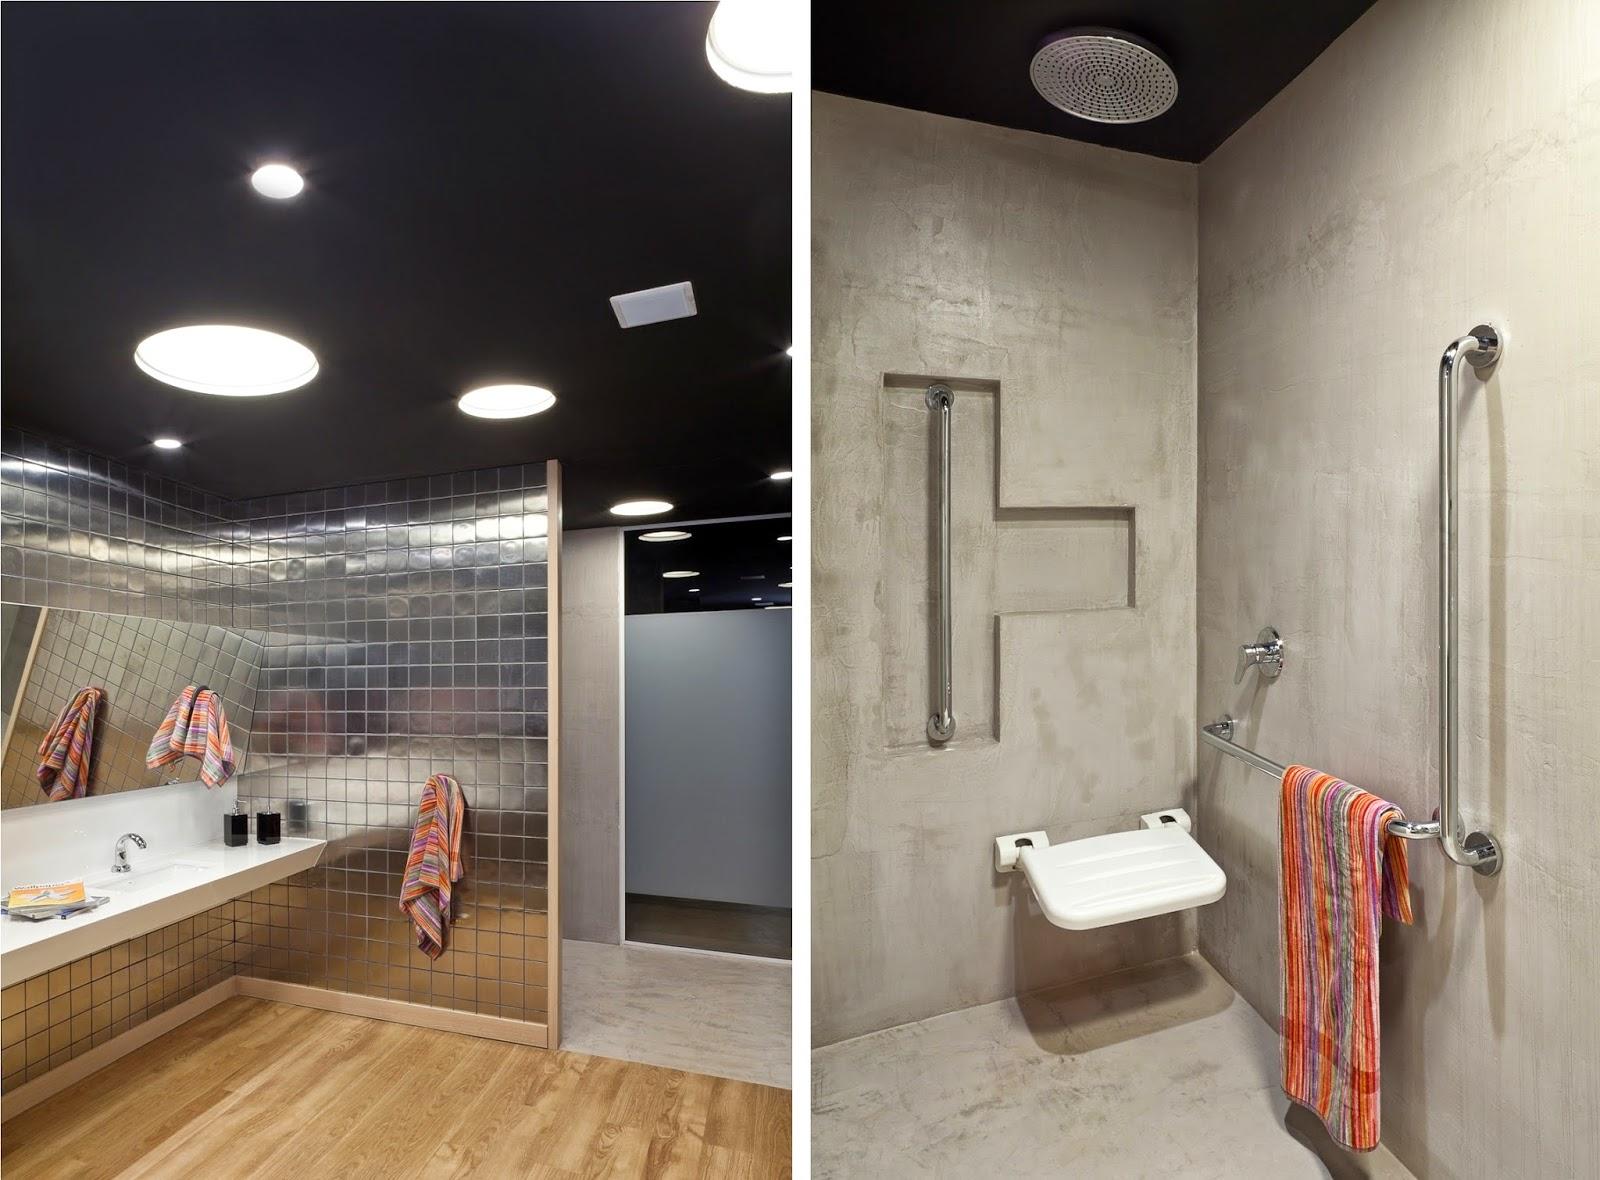 Banheiro Adaptado #A34228 1600x1180 Altura Bancada Banheiro Deficiente